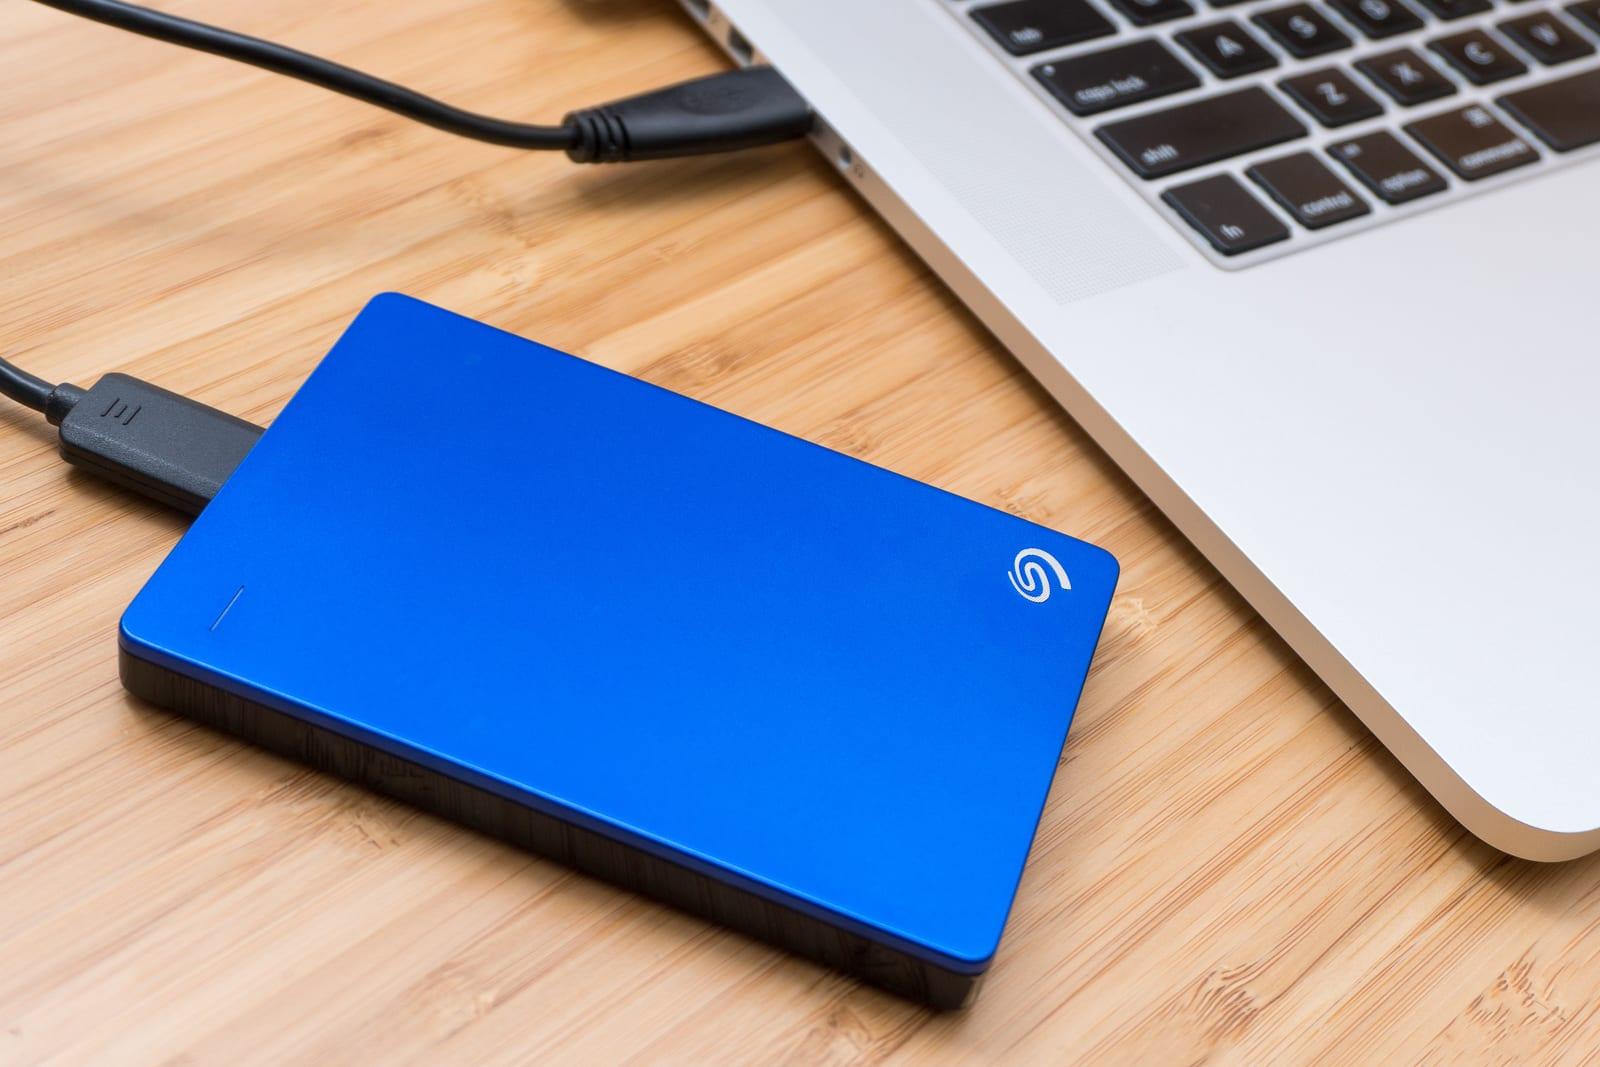 Portable hard drive